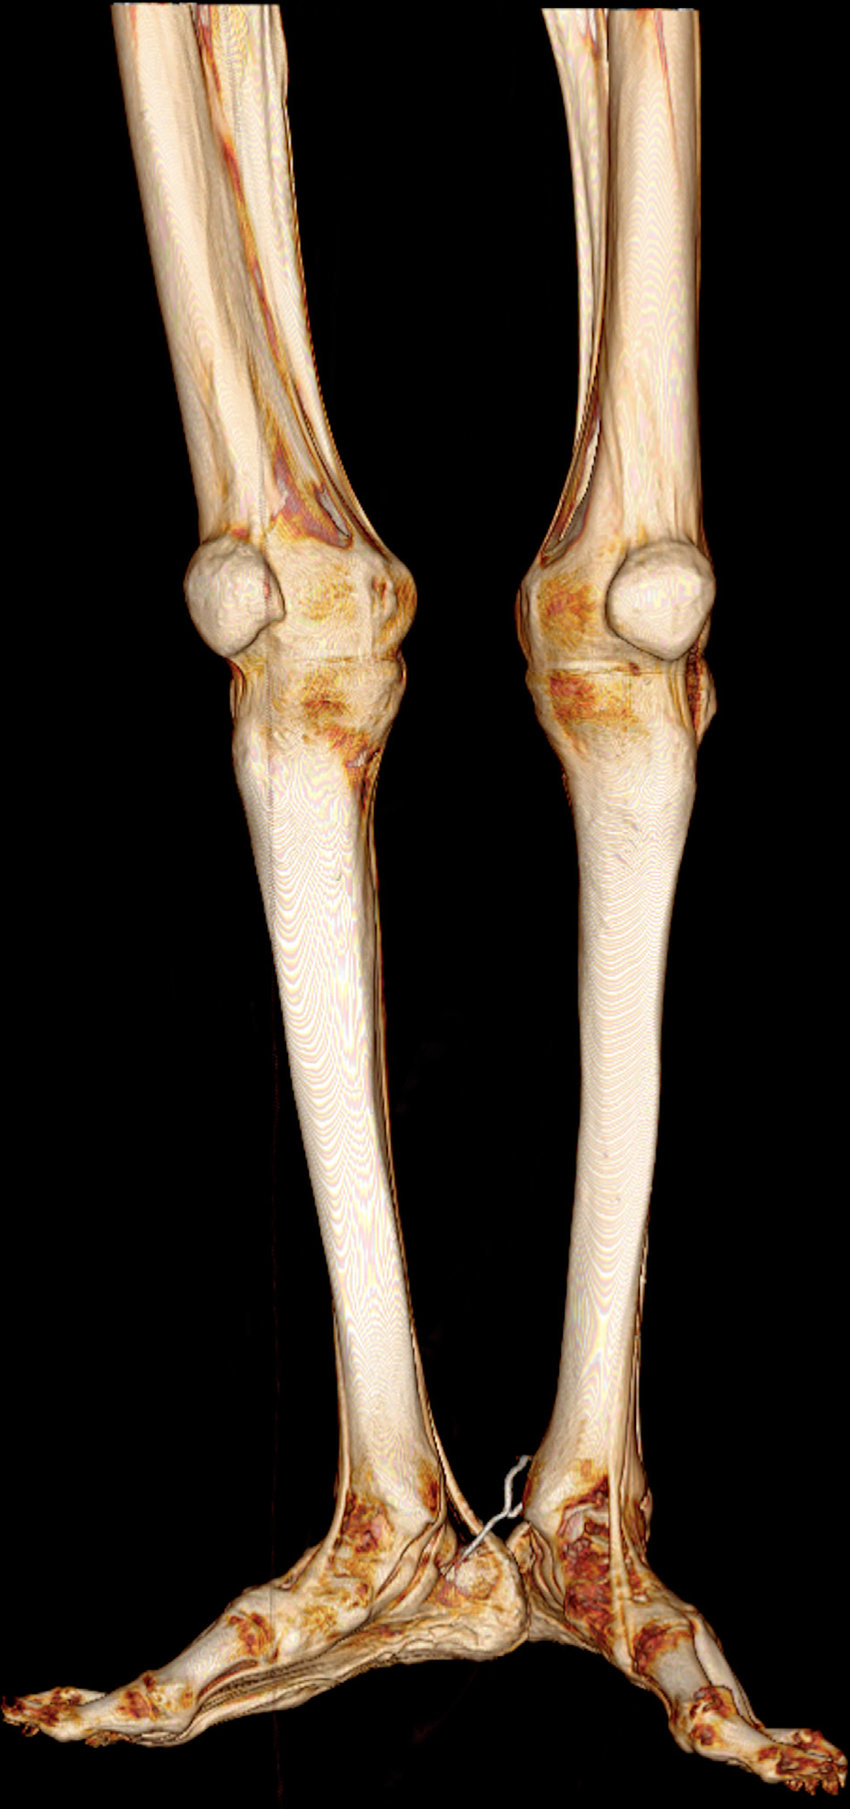 hight resolution of lower extremities